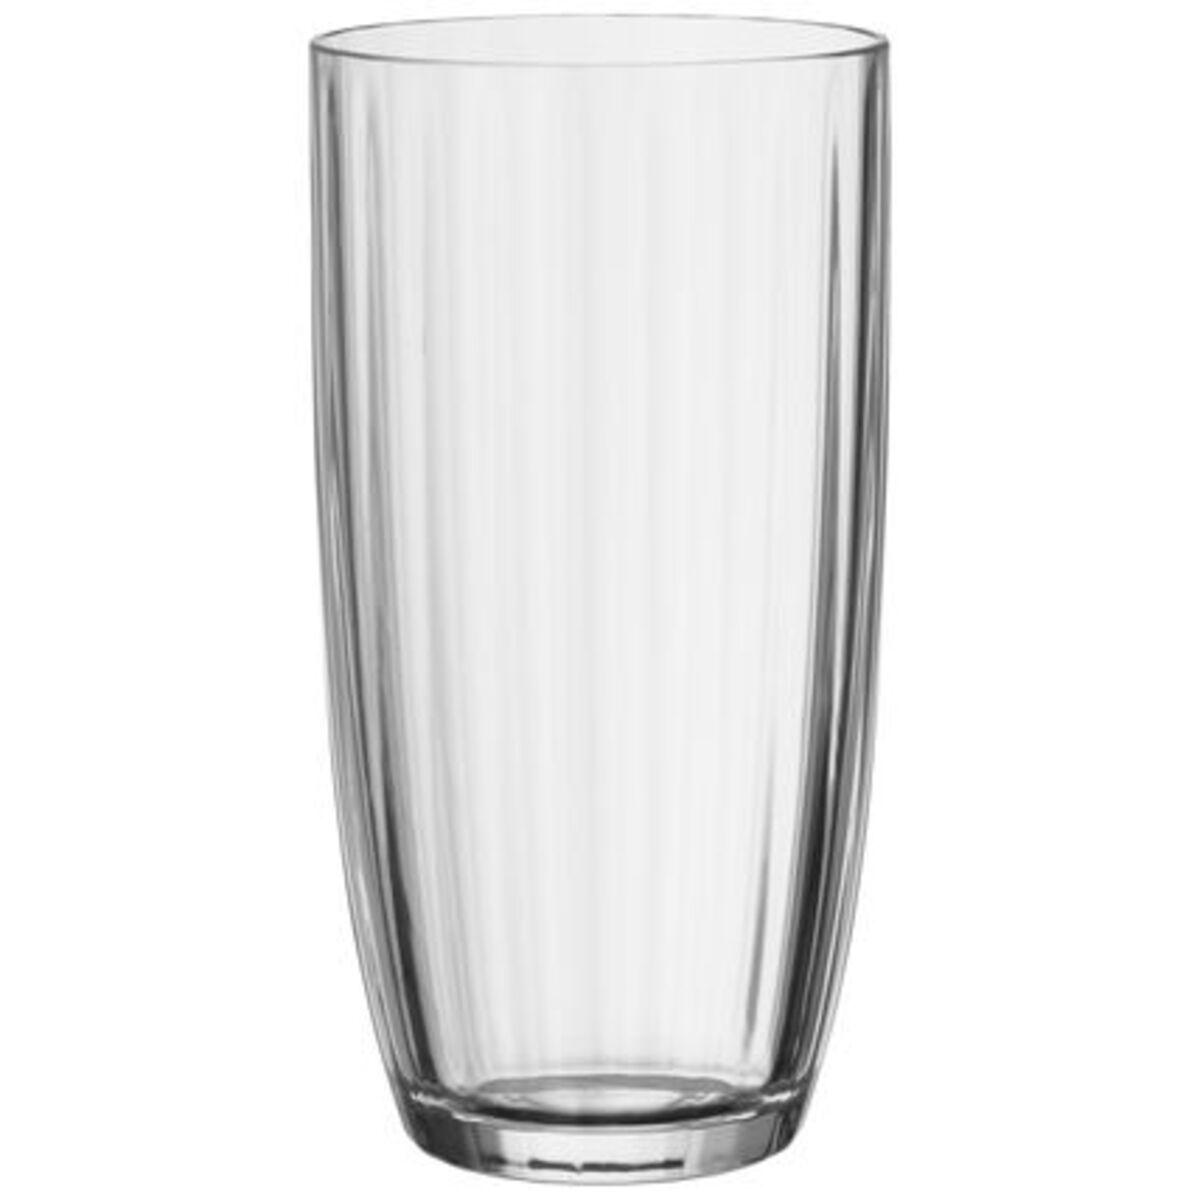 Bild 1 von Villeroy & Boch Becher gross Artesano Original Glass